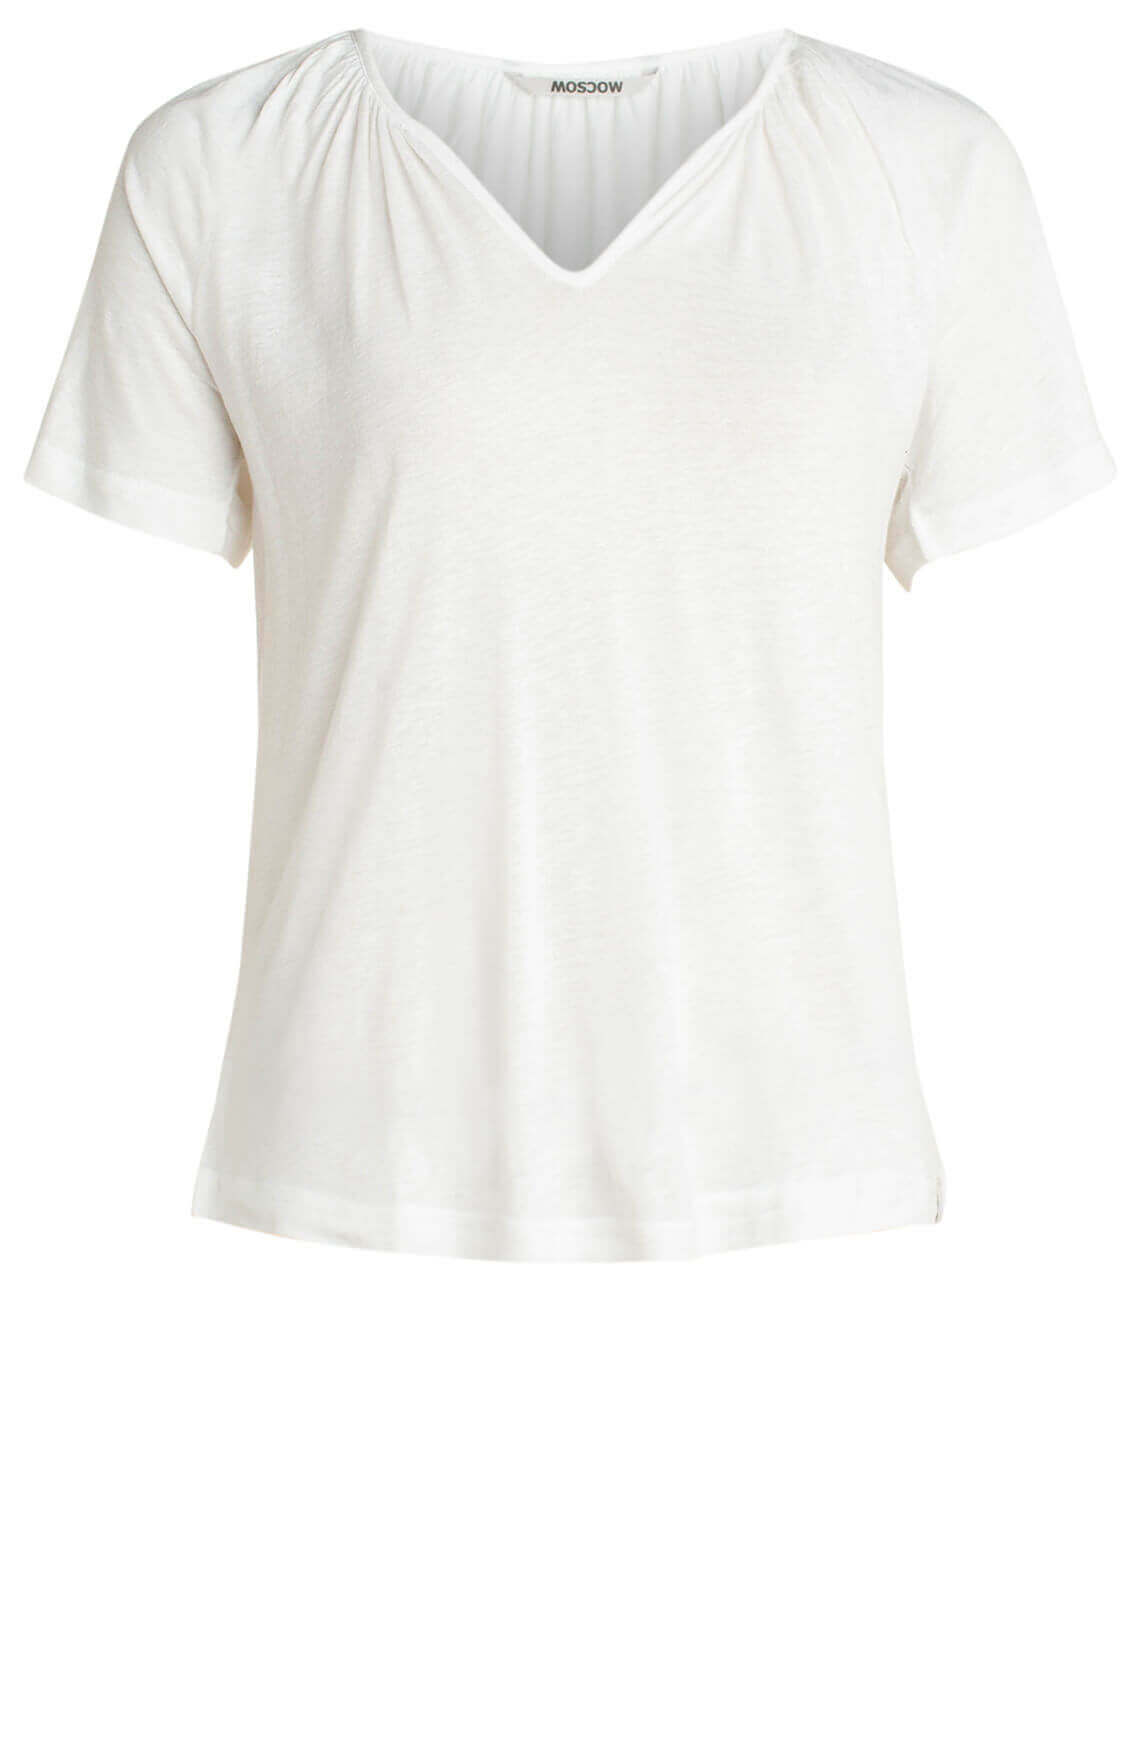 Moscow Dames Shirt met V-hals wit